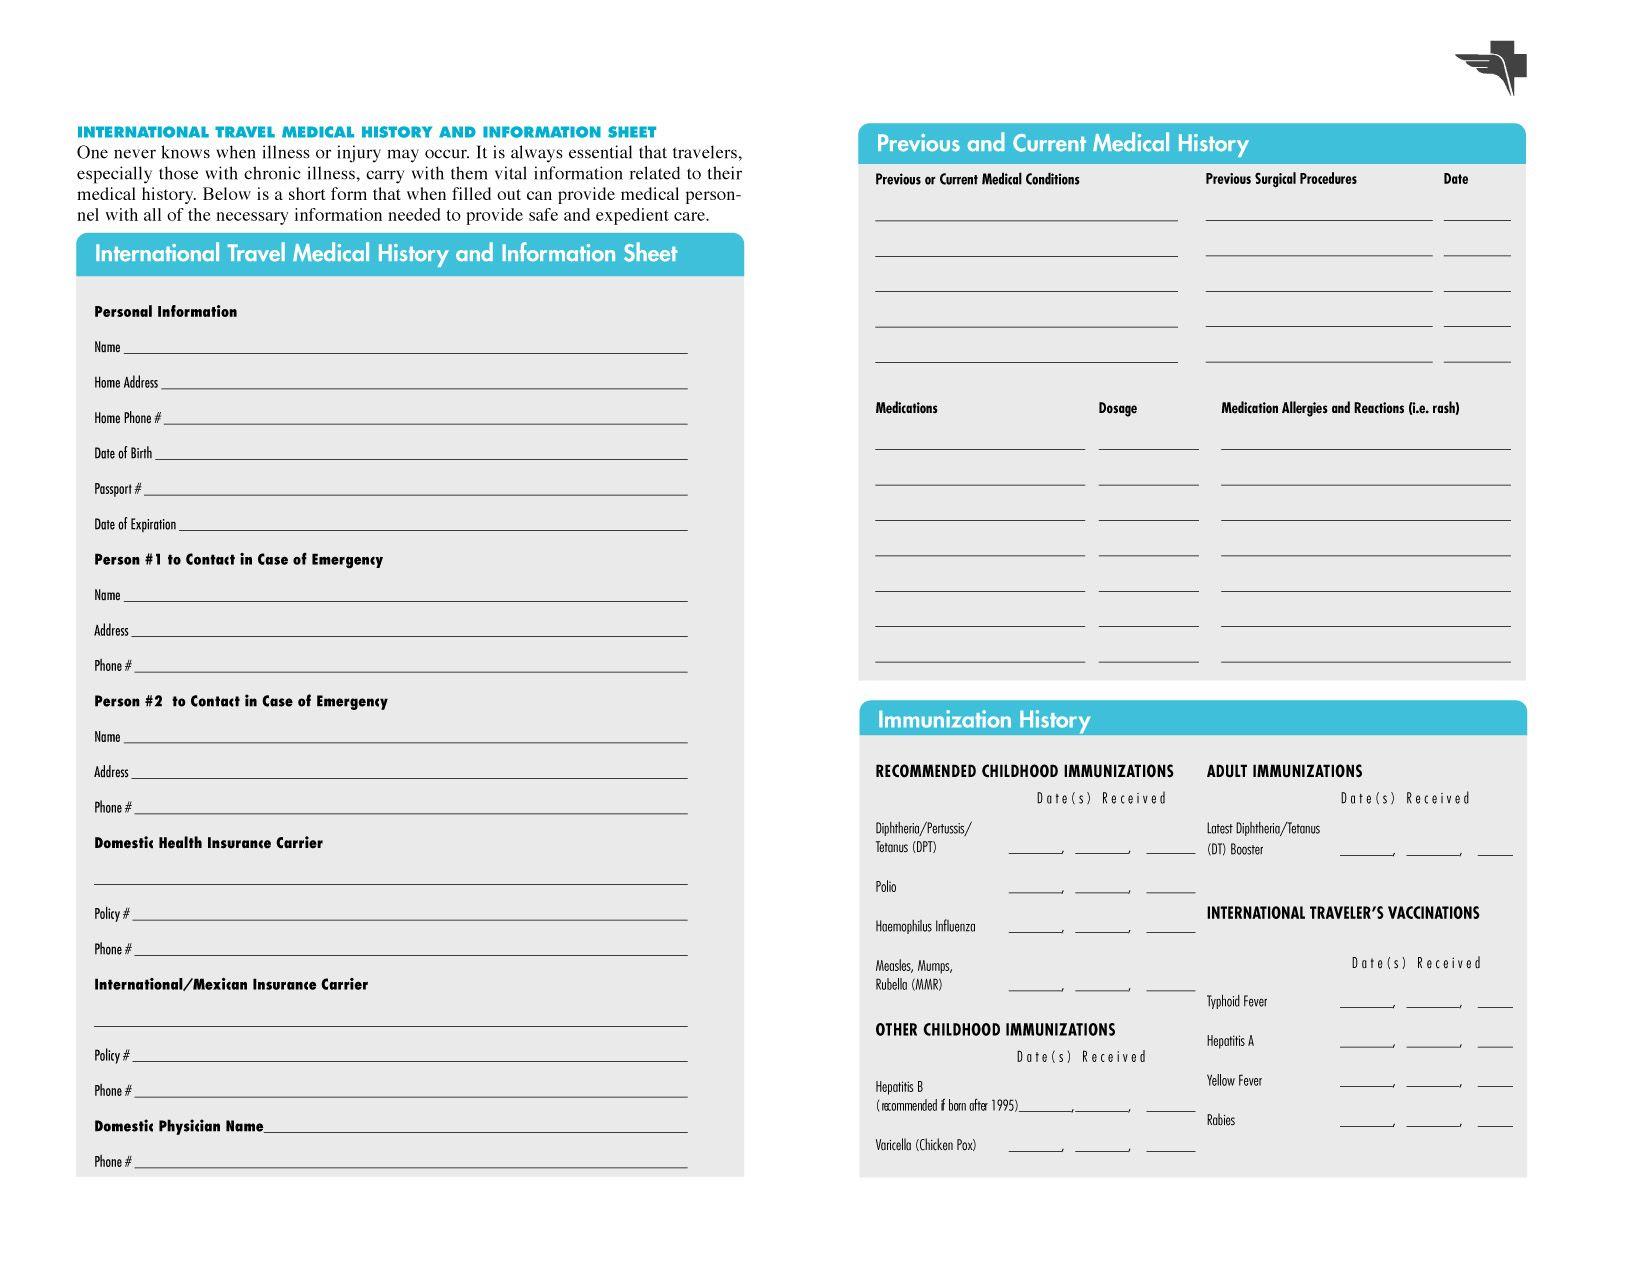 Free Printables | Free Printable Family Medical History Forms - Free Printable Medical History Forms